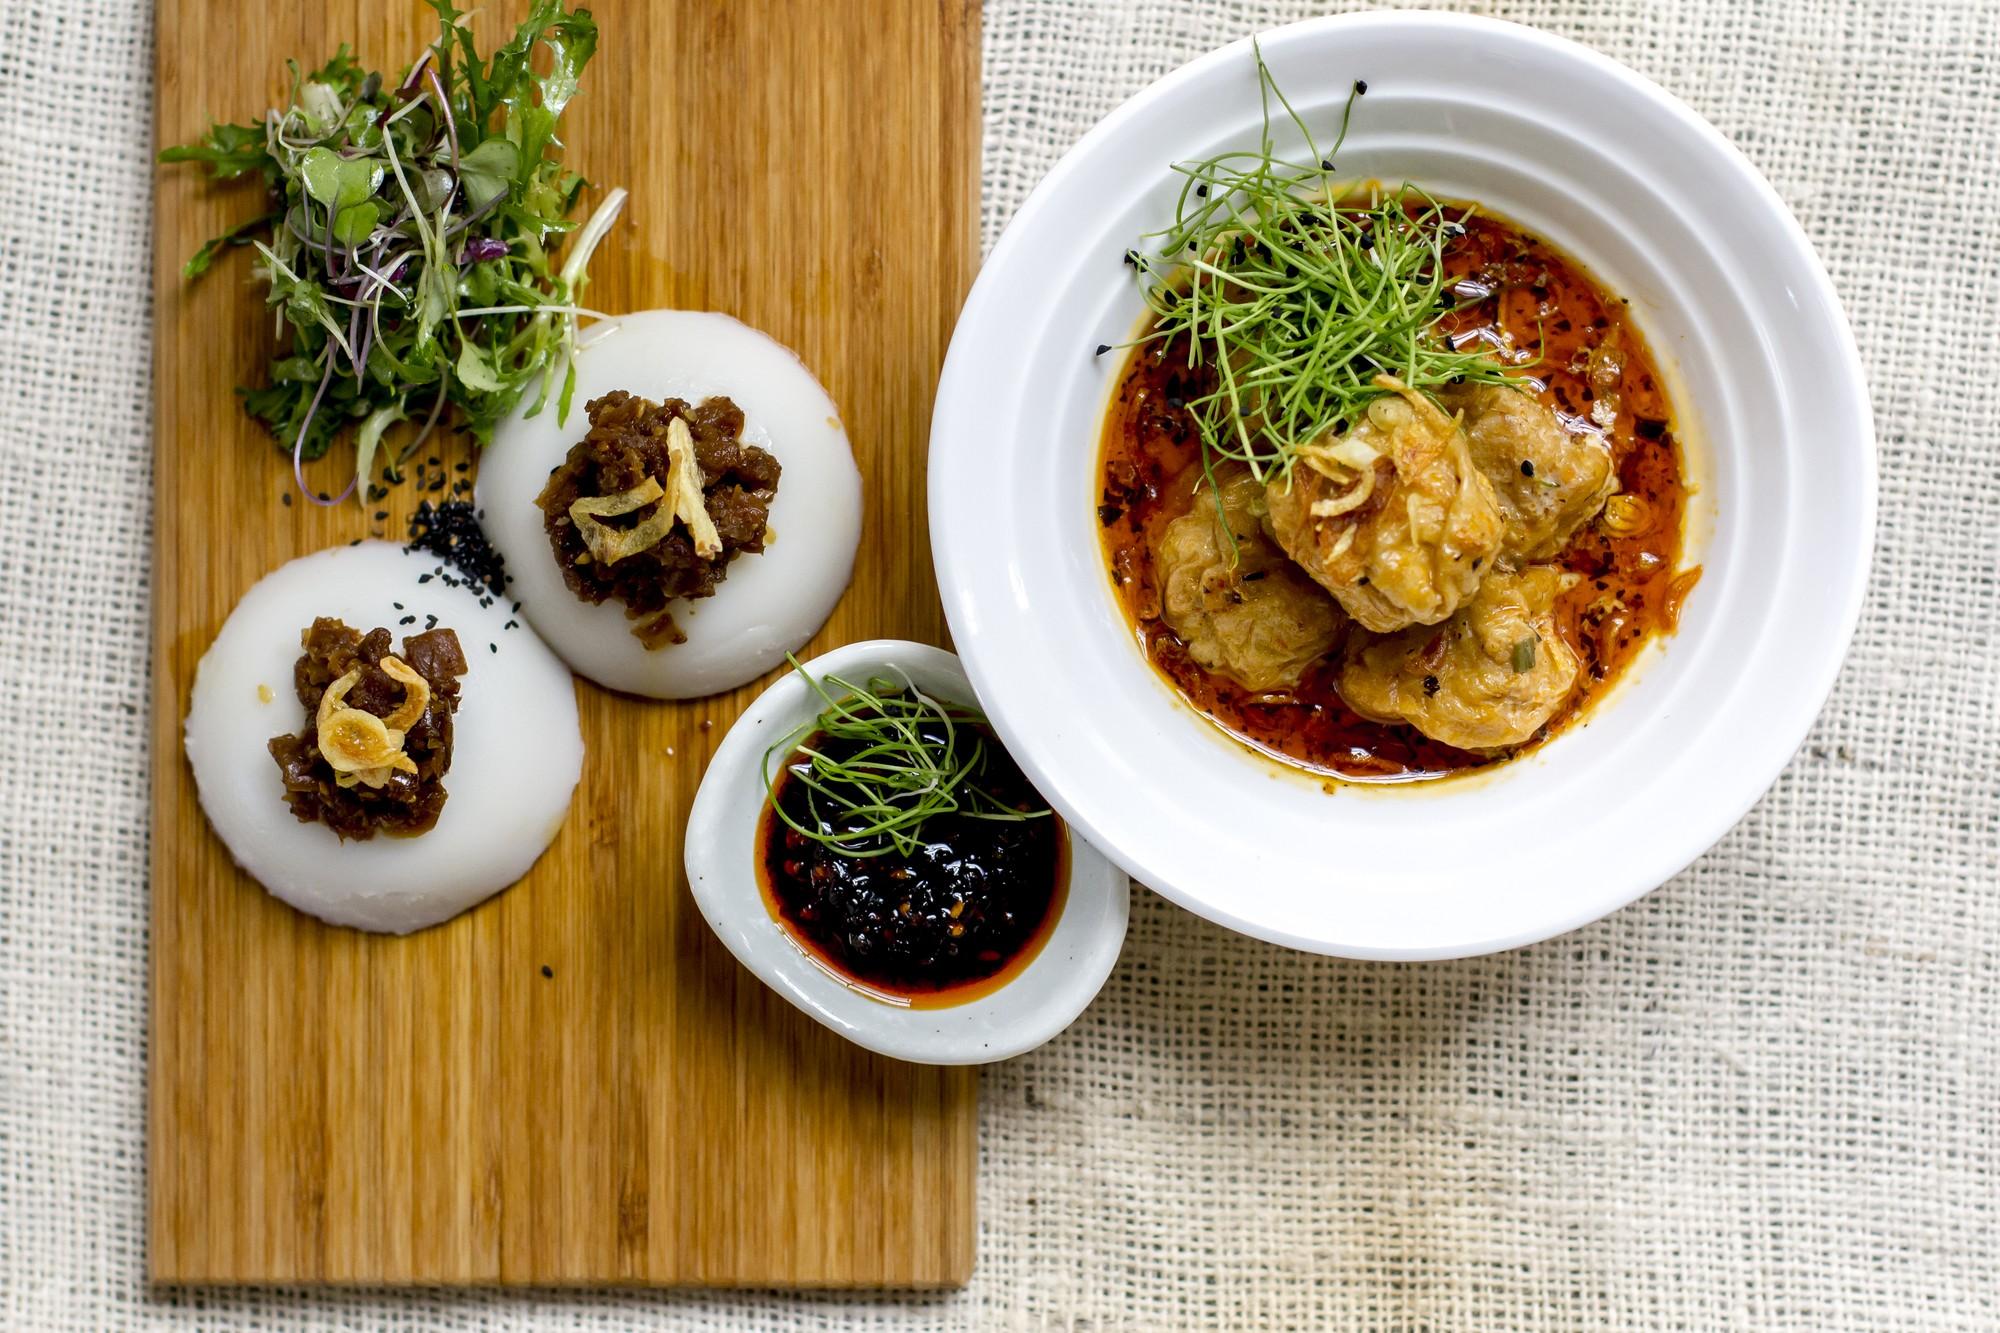 Sample Lunch / Dinner Menu